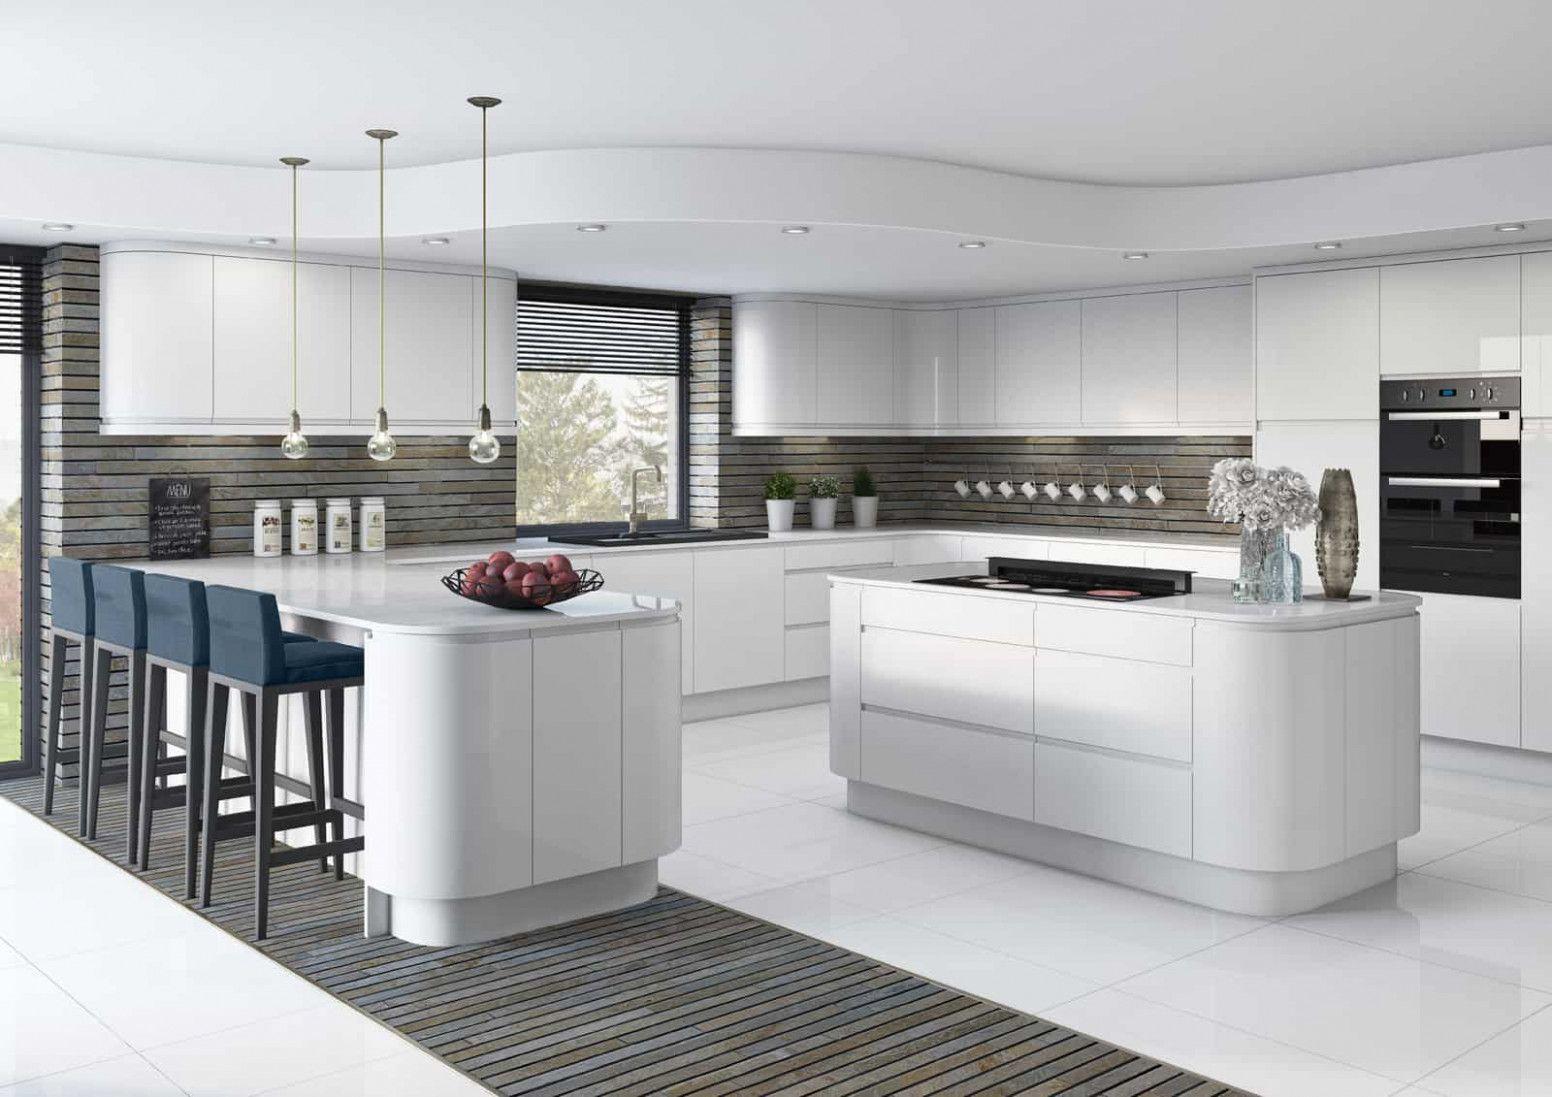 White Kitchen Ideas Uk Design White Kitchen Ideas Uk Allowed To Help The Blog Site With Kitchen Room Design Kitchen Design Small Interior Design Kitchen